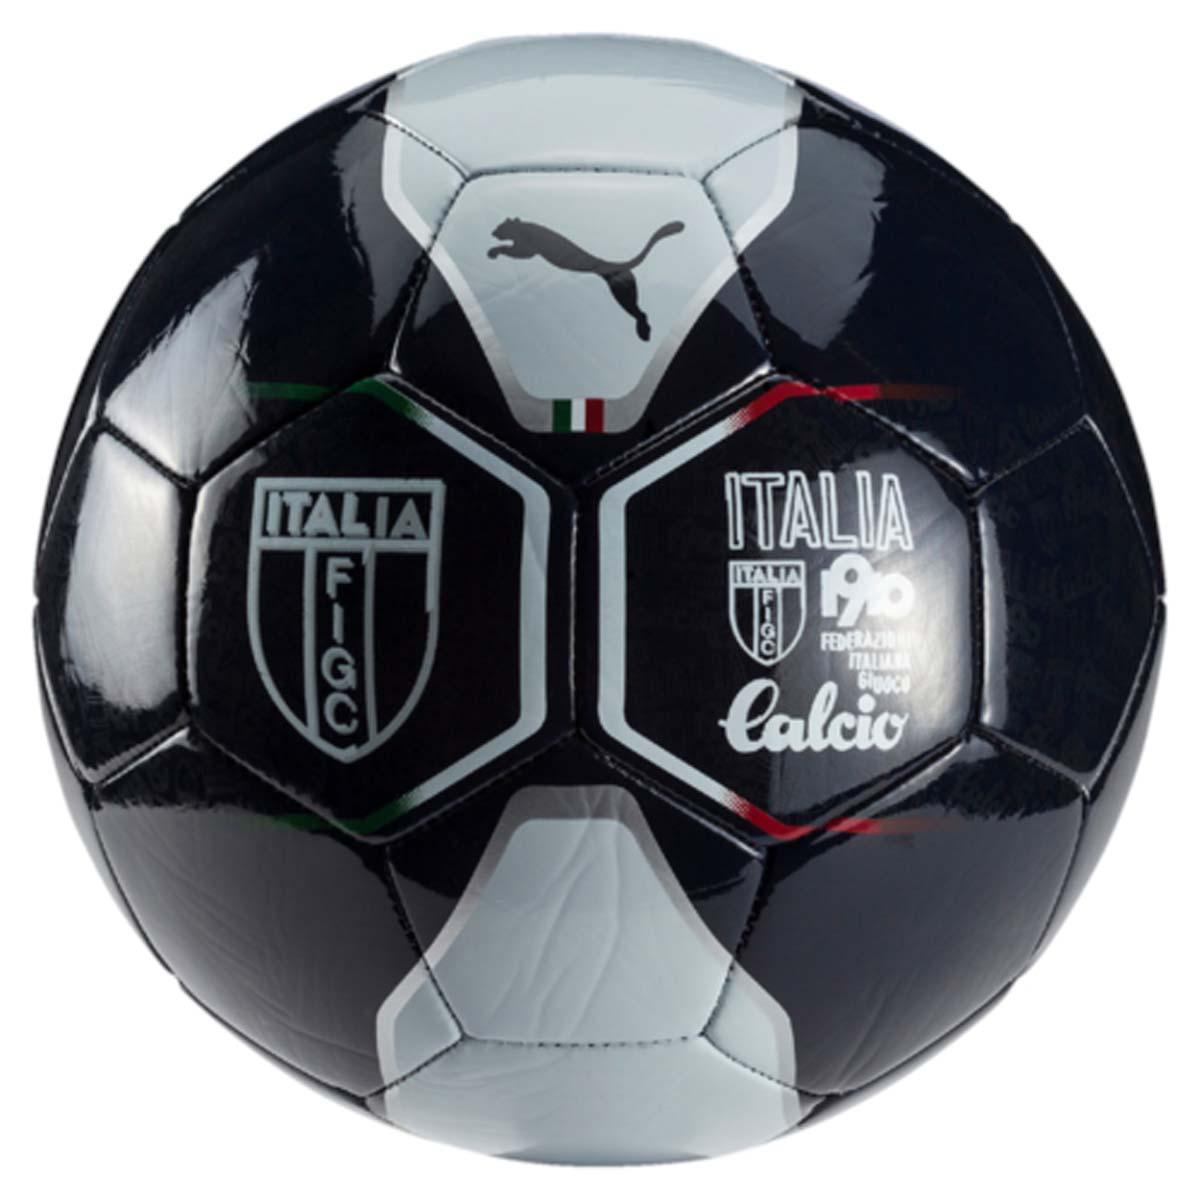 Мяч футбольный Puma Italia Fan Ball, цвет: синий. 08273801. Размер 508273801